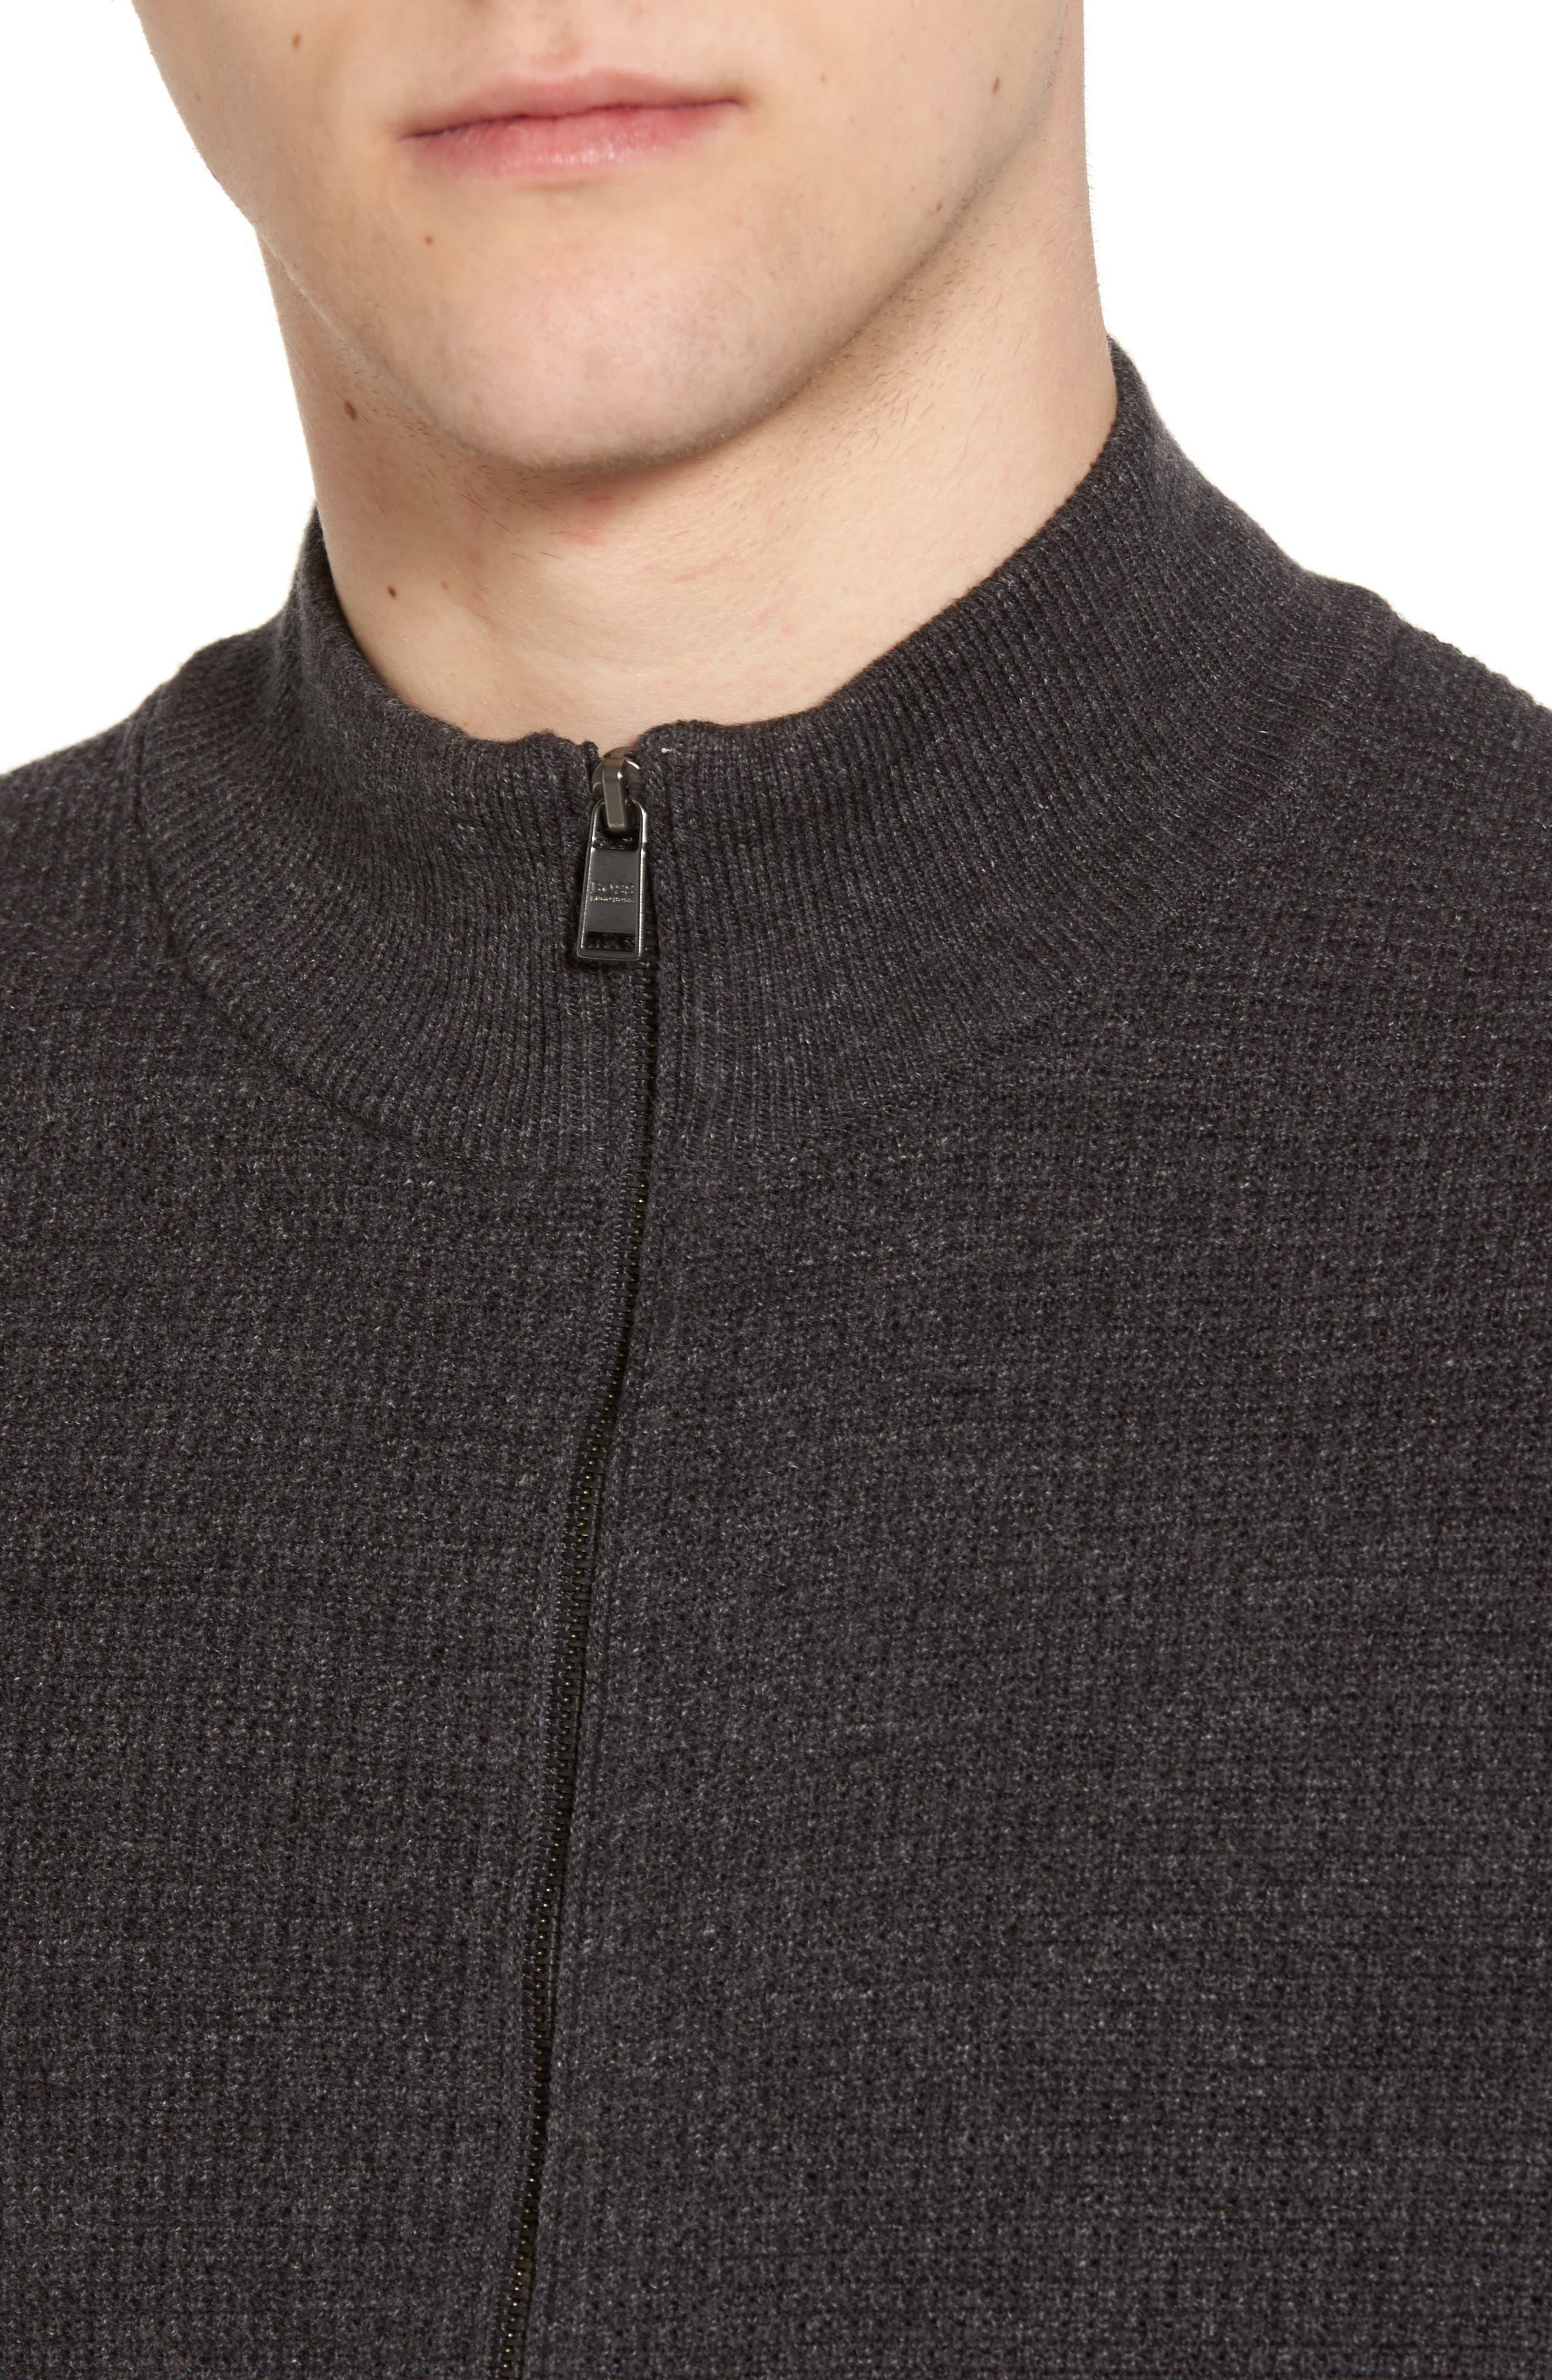 Devino Cotton Zip Jacket,                             Alternate thumbnail 4, color,                             Grey